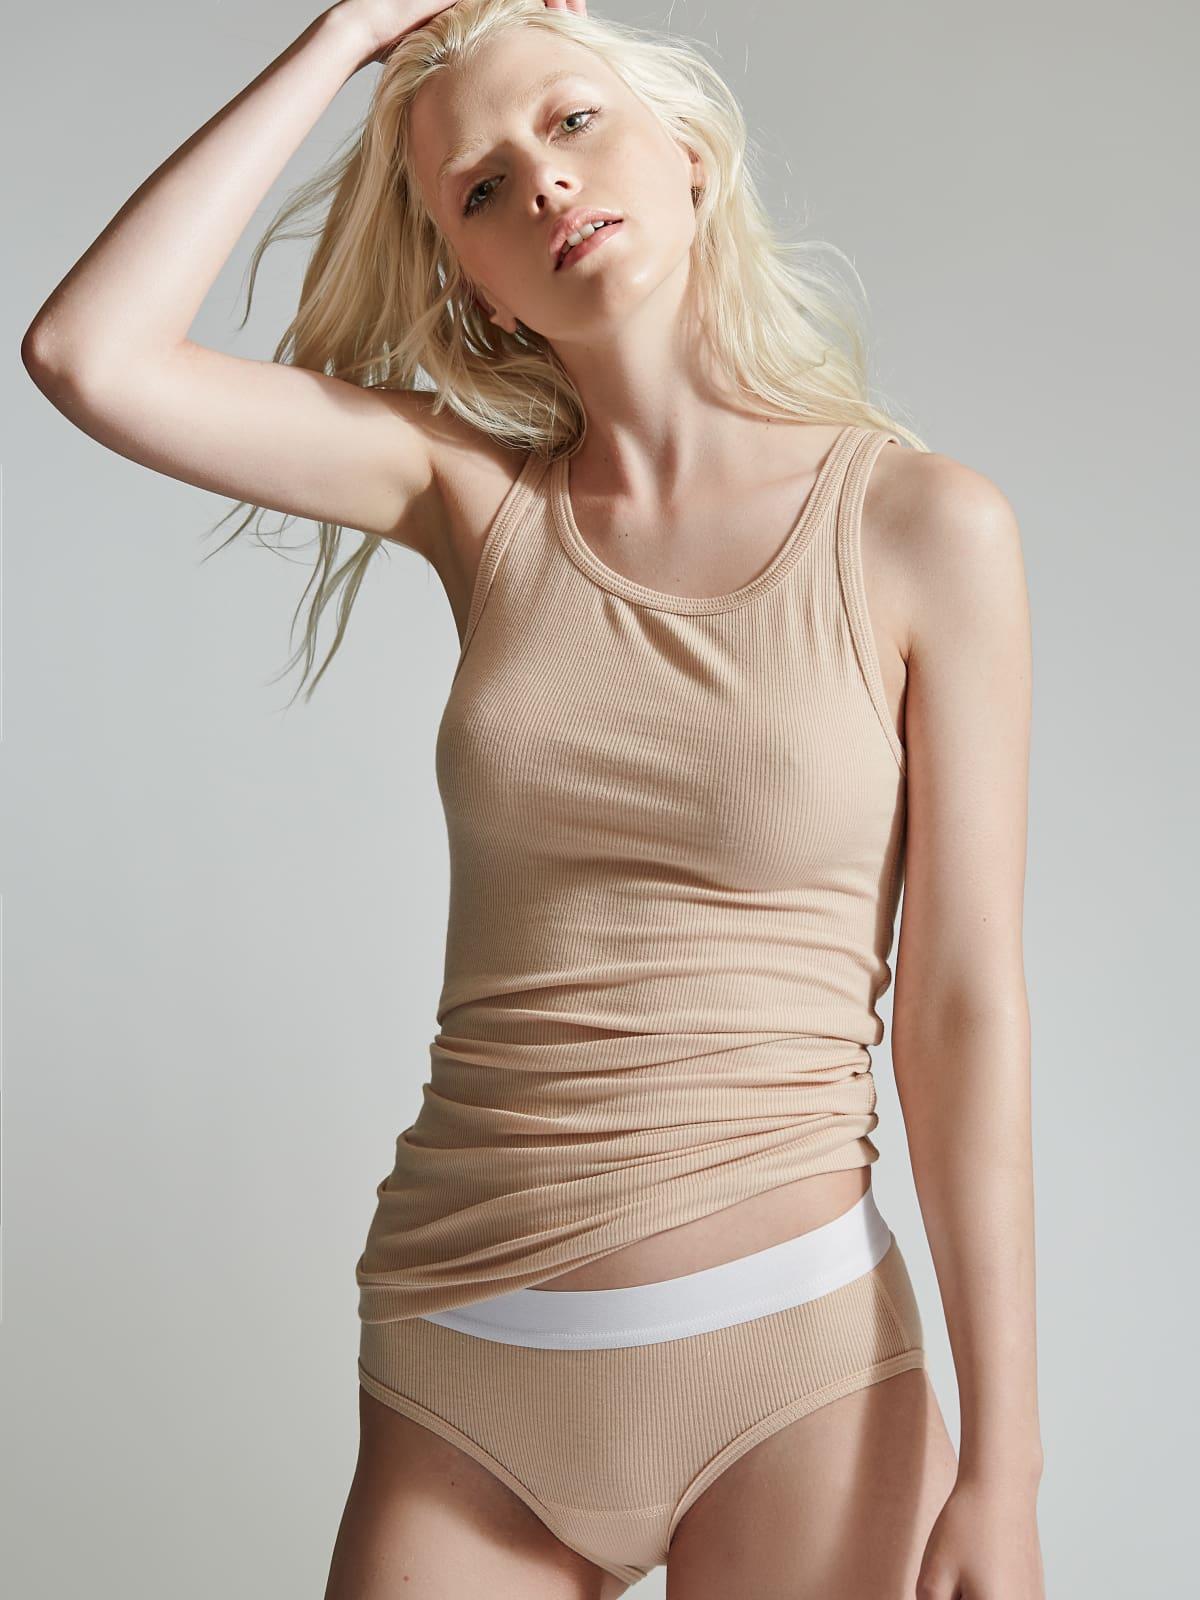 Sloane and Tate underwear brand